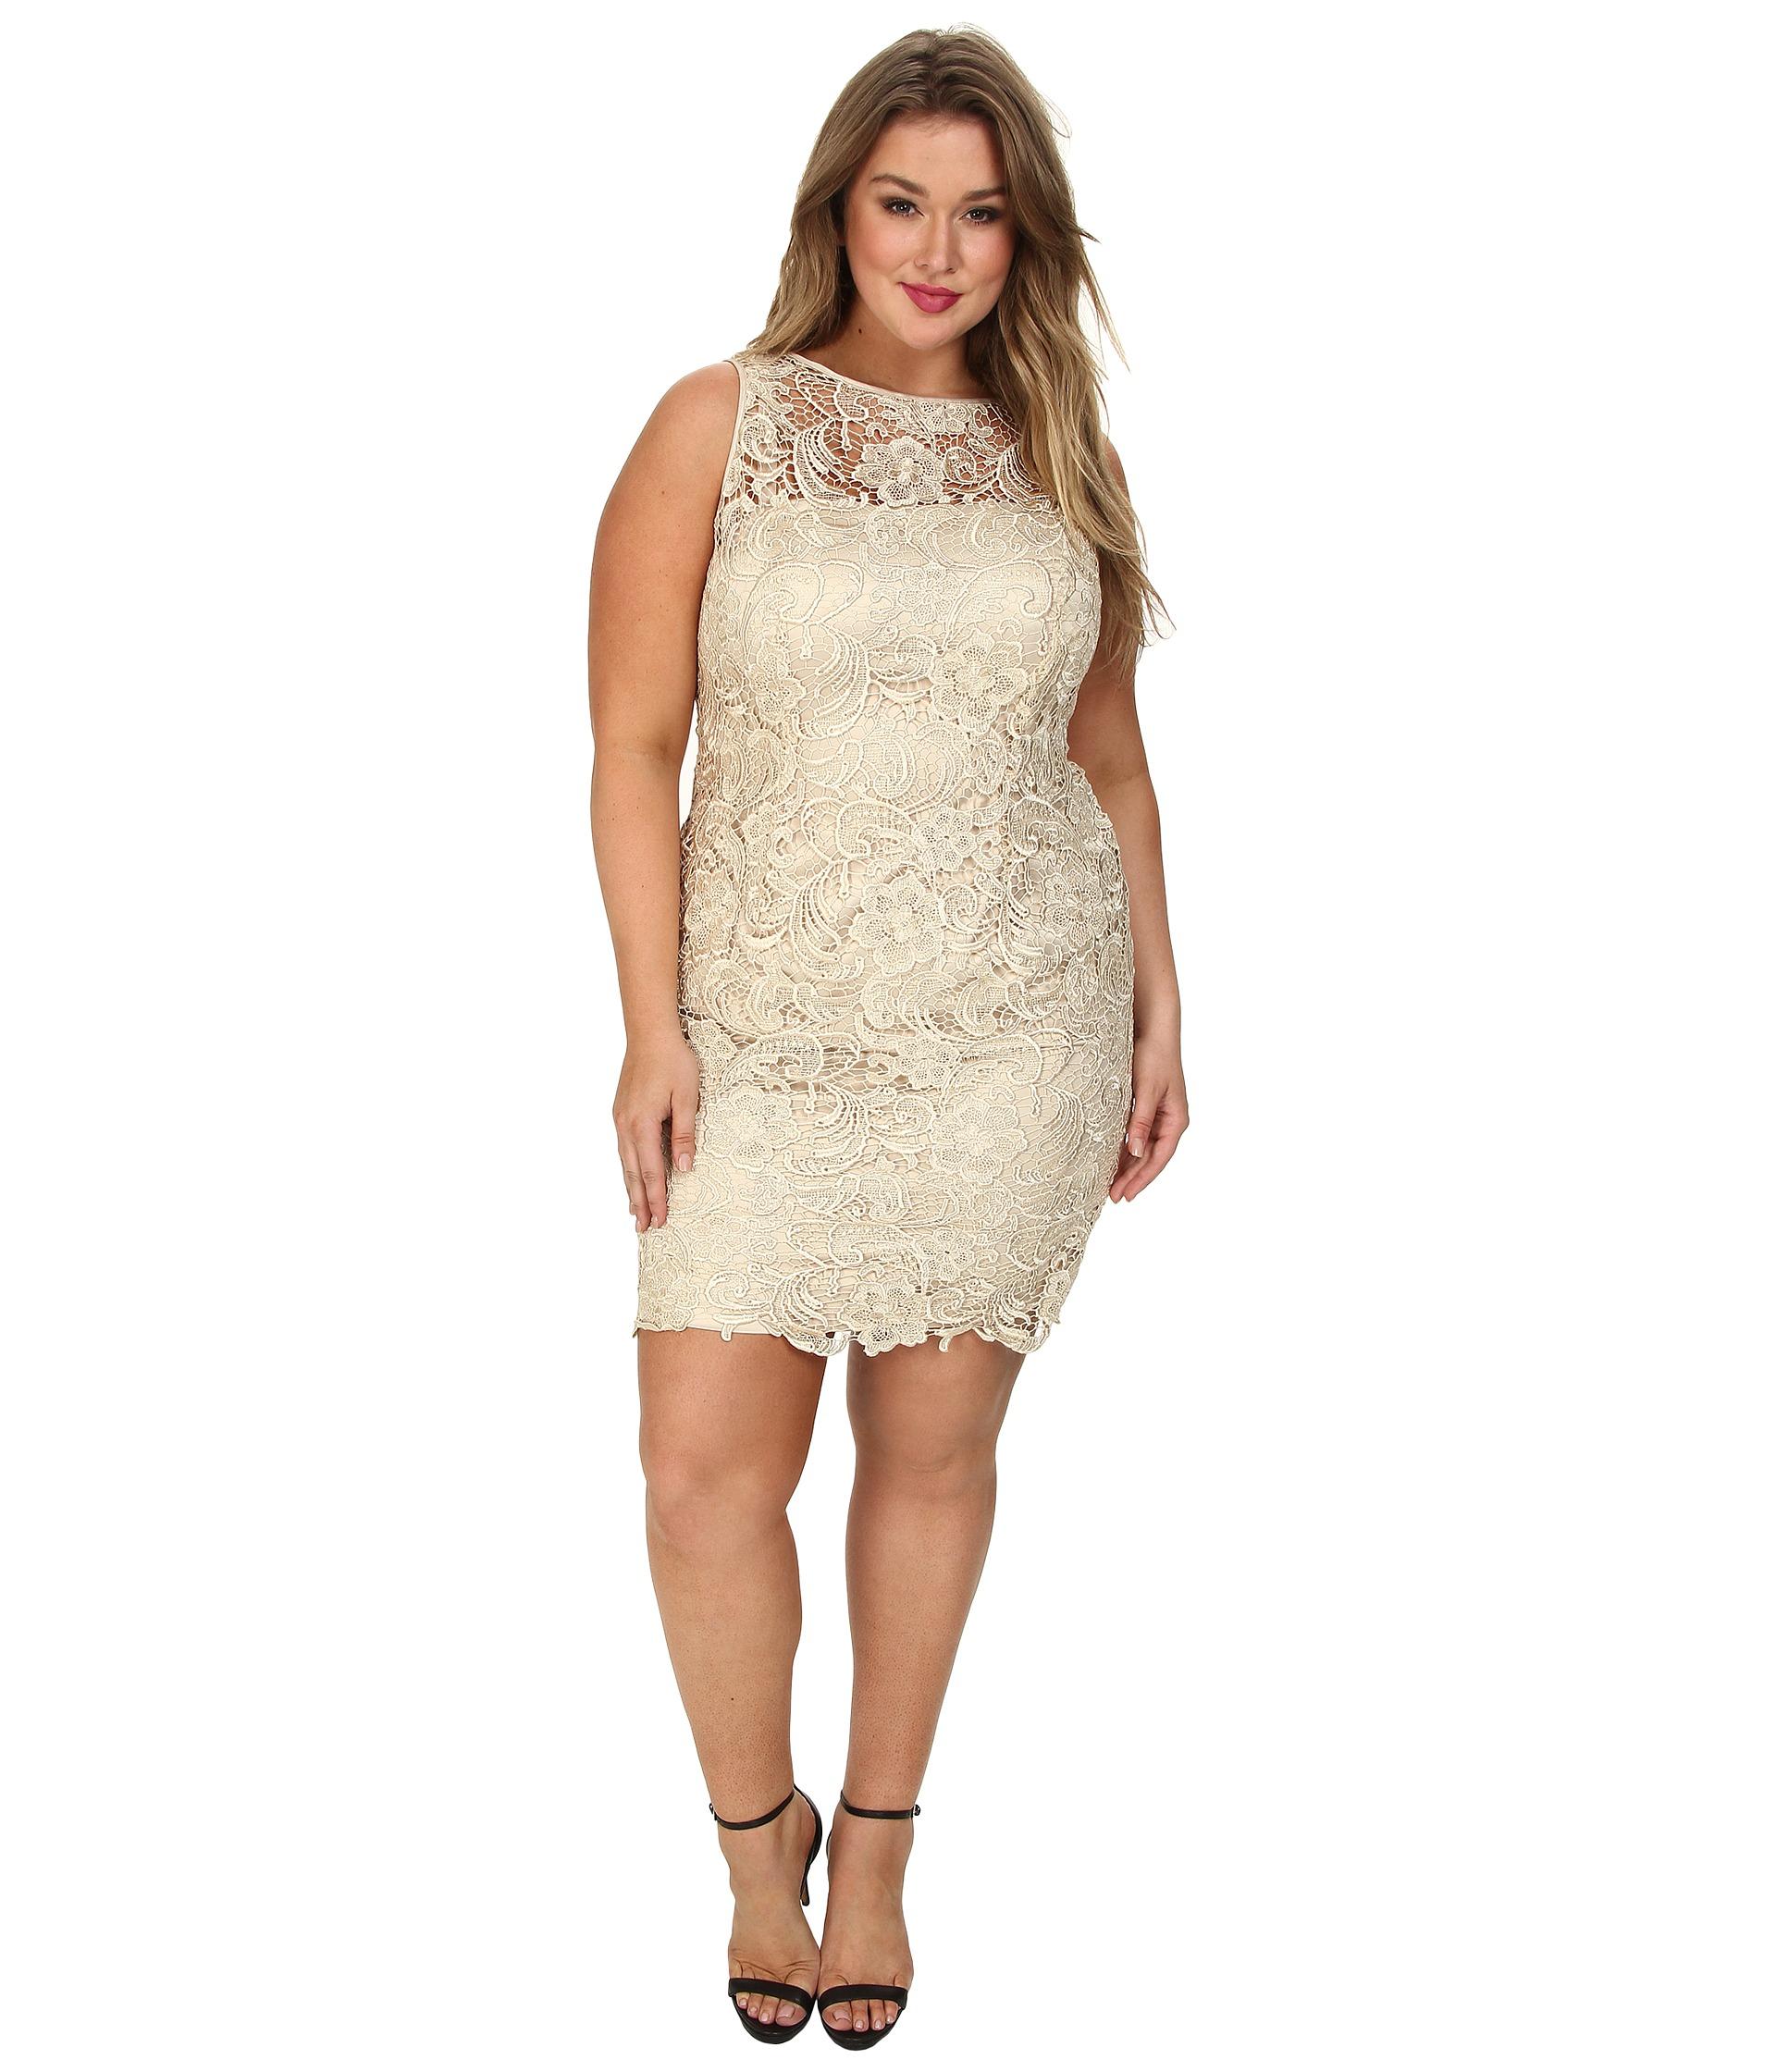 Adrianna Papell Metallic Plus Size Illusion Neck Lace Dress